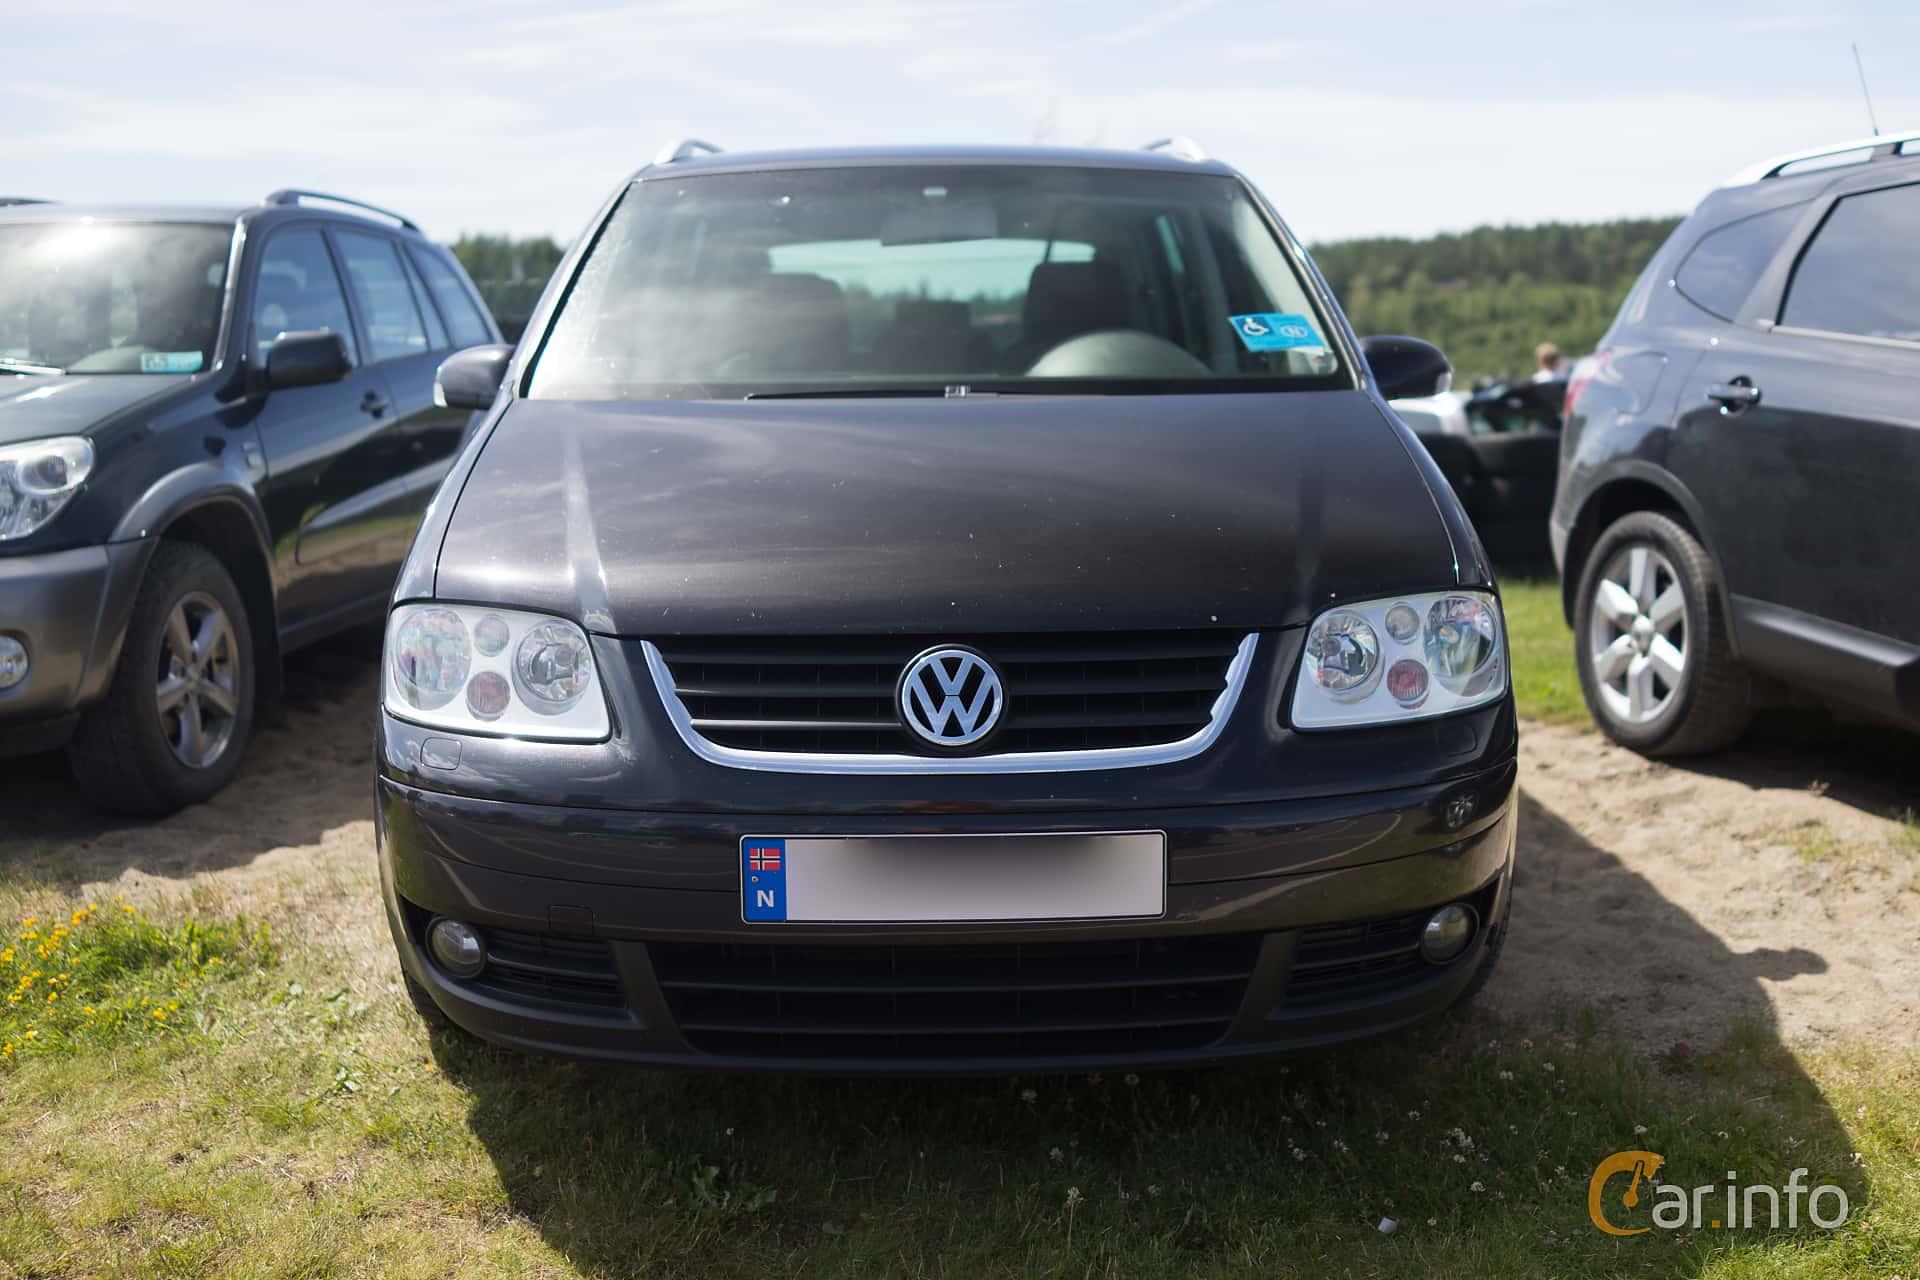 Front of Volkswagen Touran 1.9 TDI Manual, 105ps, 2005 at Gatebil Rudskogen  juli 2015